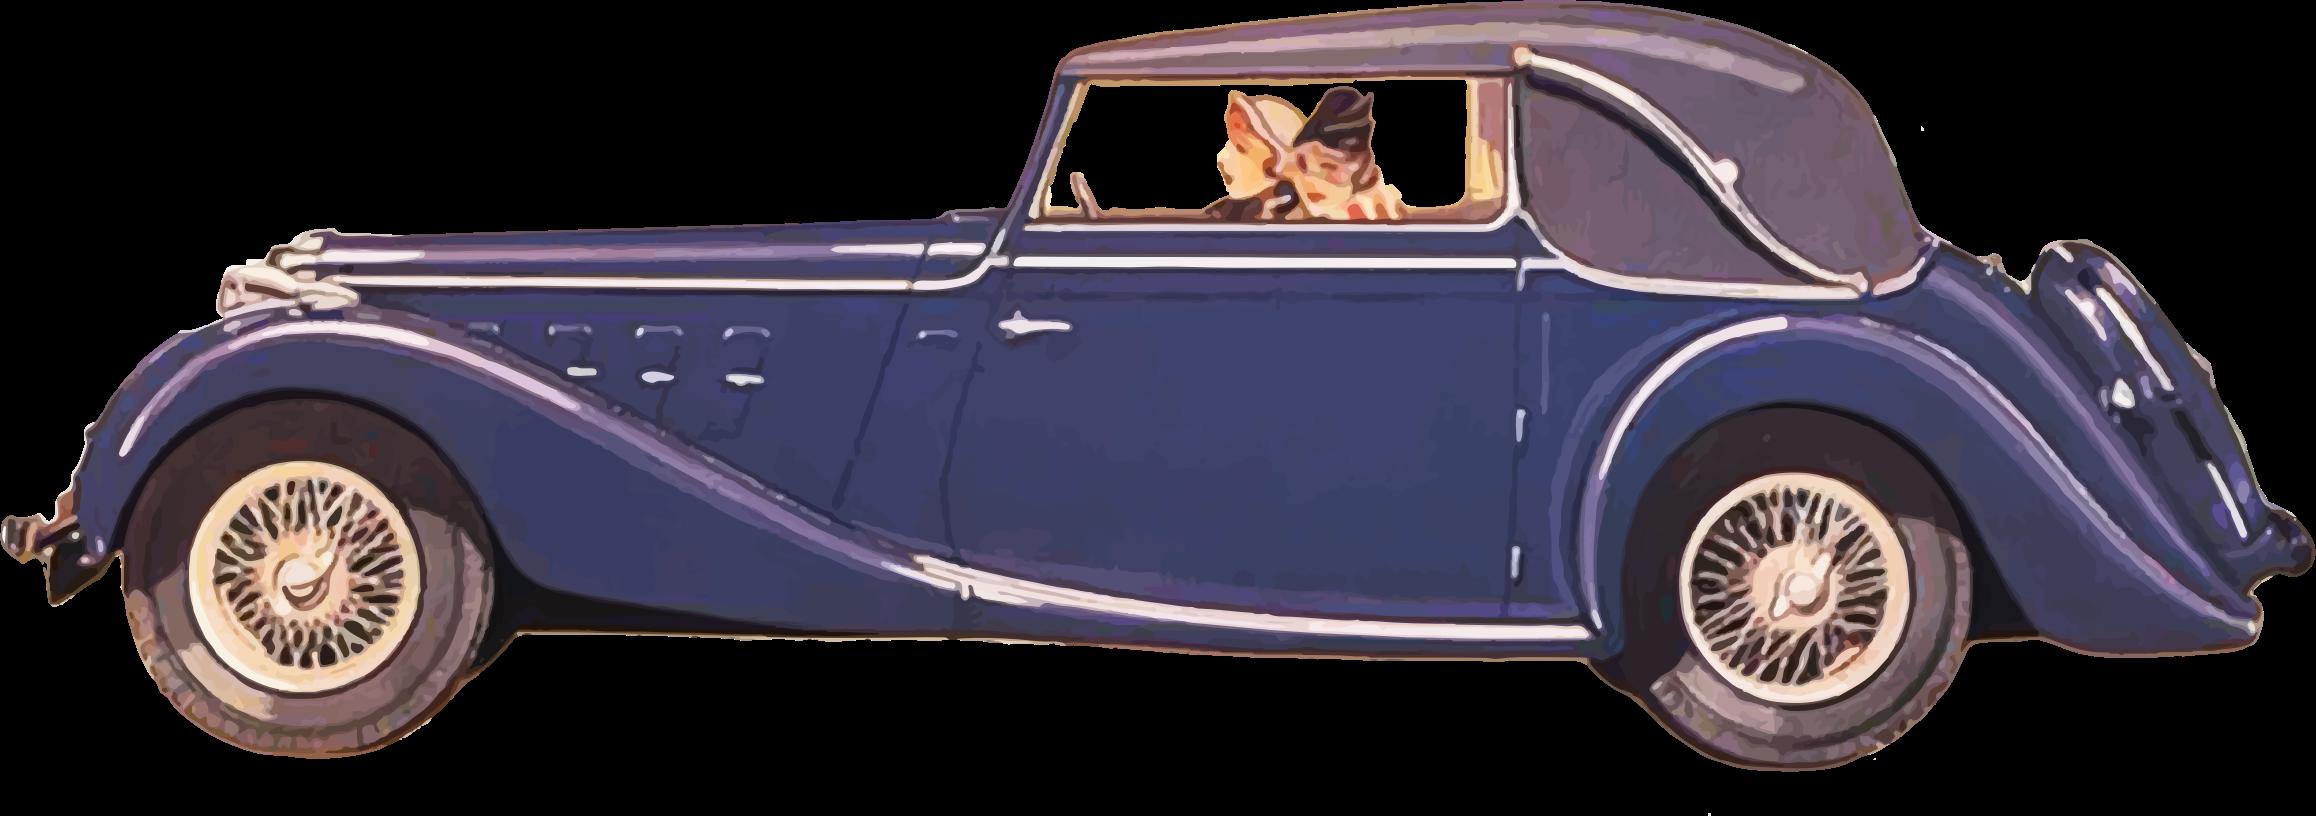 Vintage car Pickup truck Classic car Clip art.